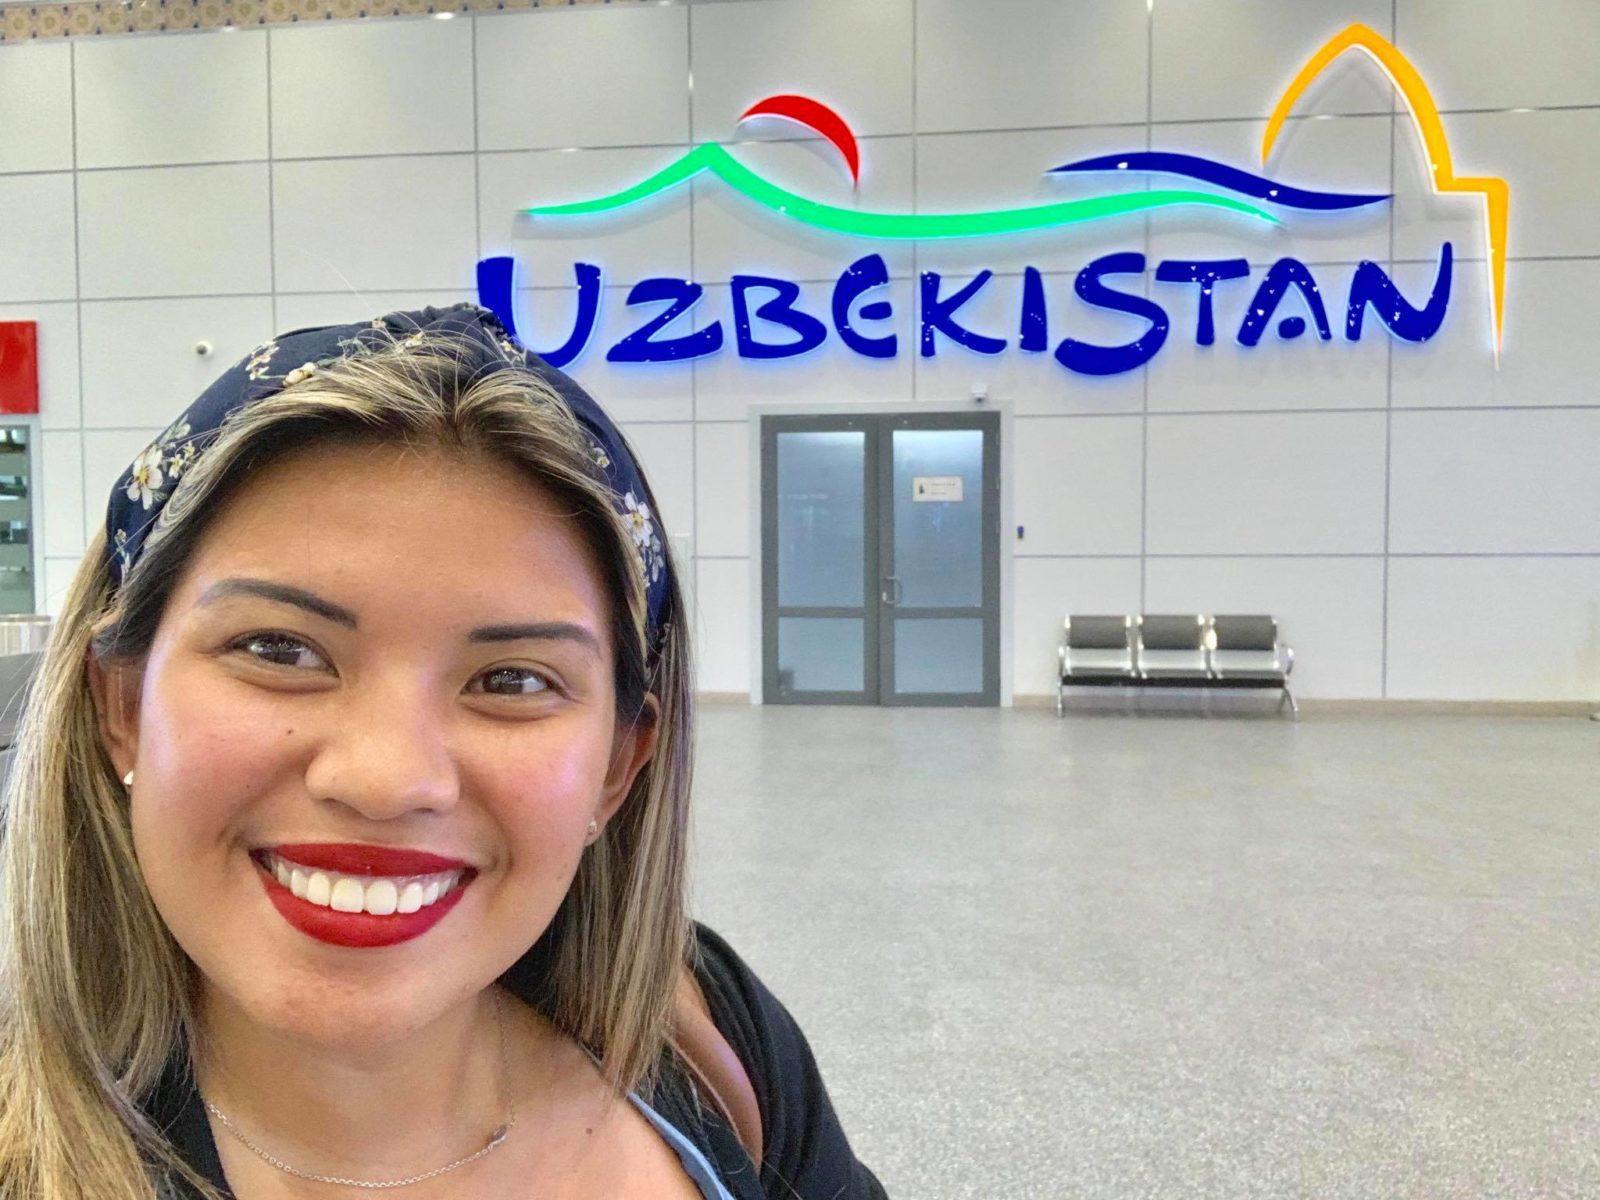 Train Ride and Overland Adventure in Uzbekistan2